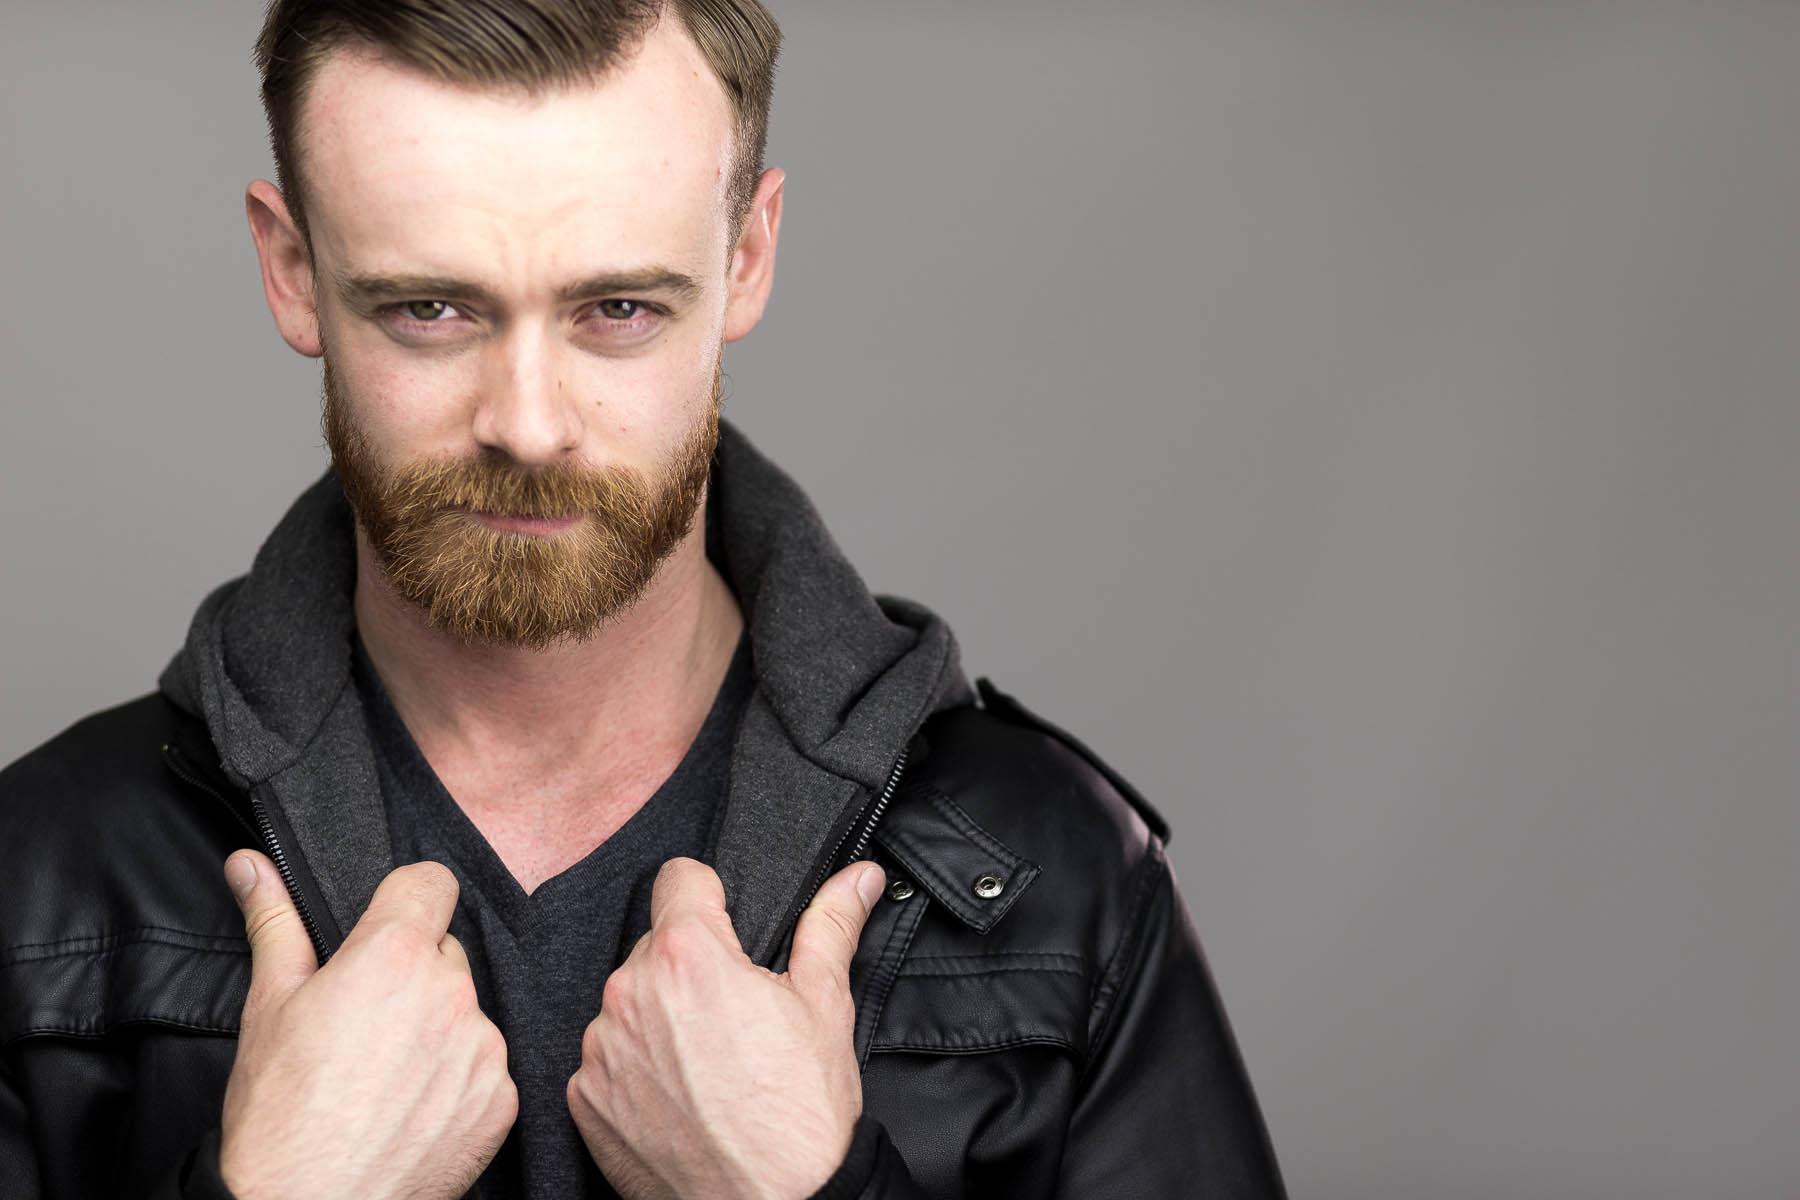 matt-actor-professional-headshot-session-19.jpg